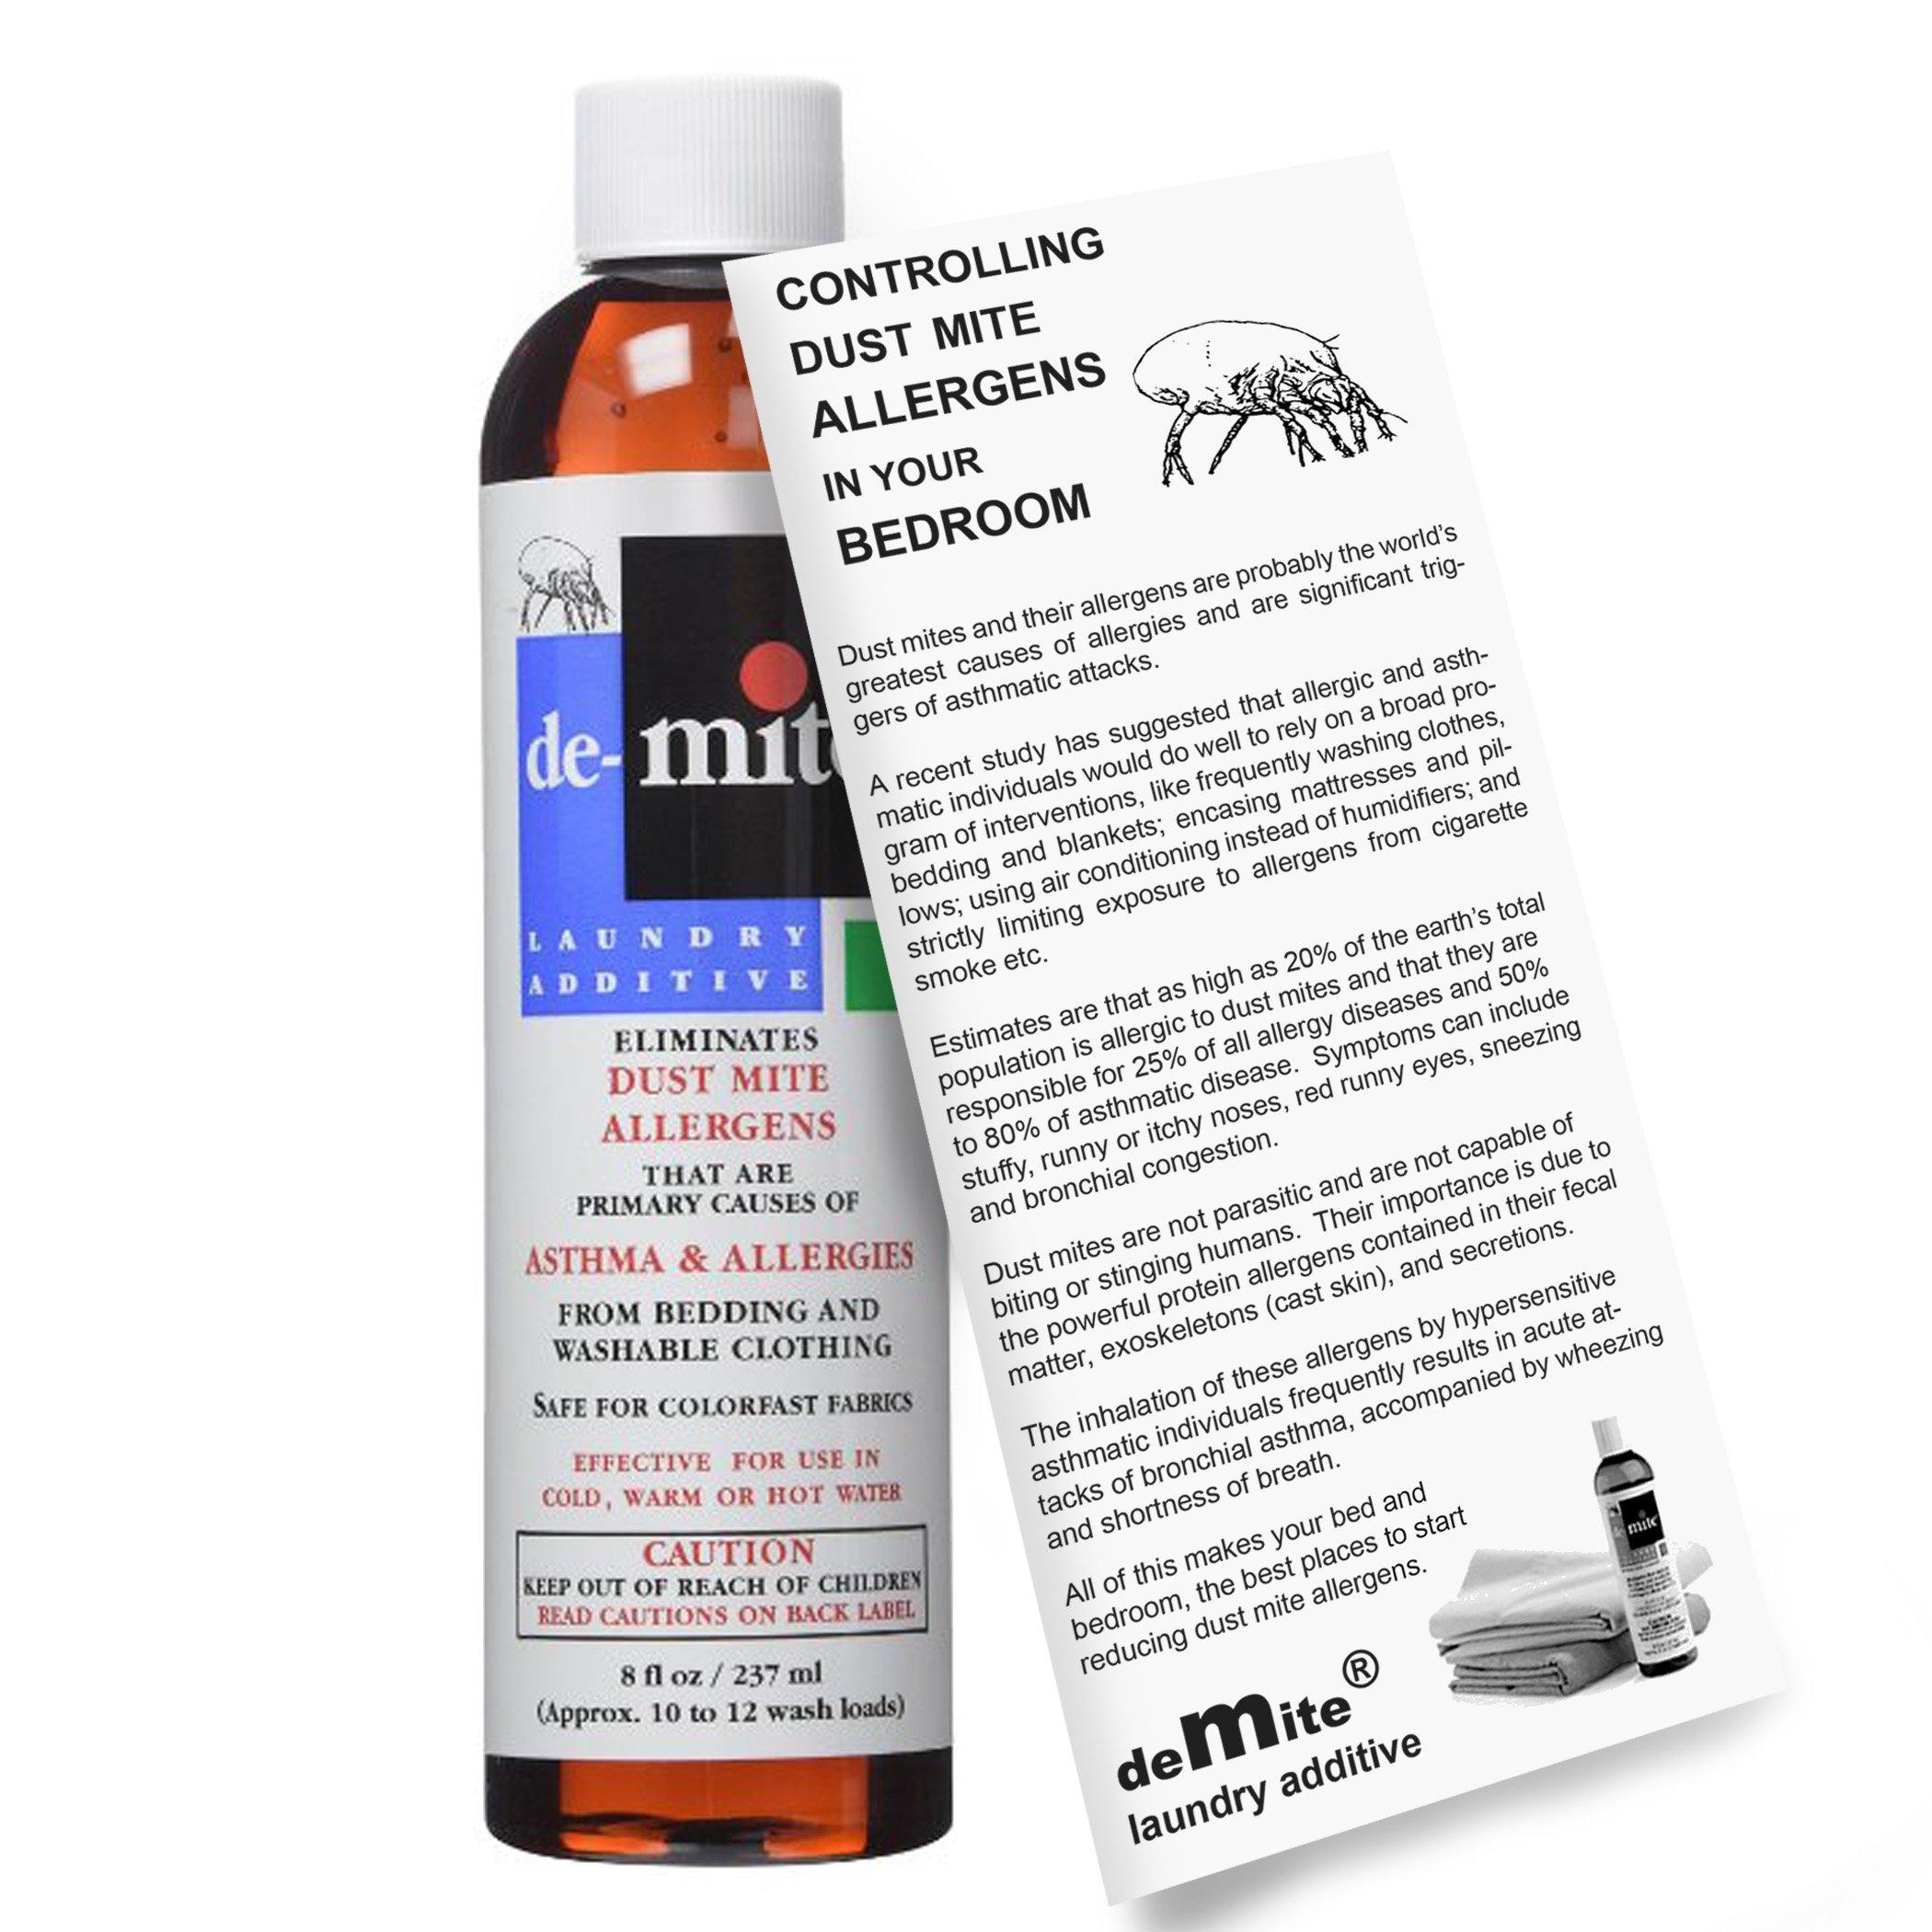 DeMite Laundry Additive (8 oz) Allergen Eliminator with Bonus Expert Pro Tips to Eliminate Dust Mite Allergens